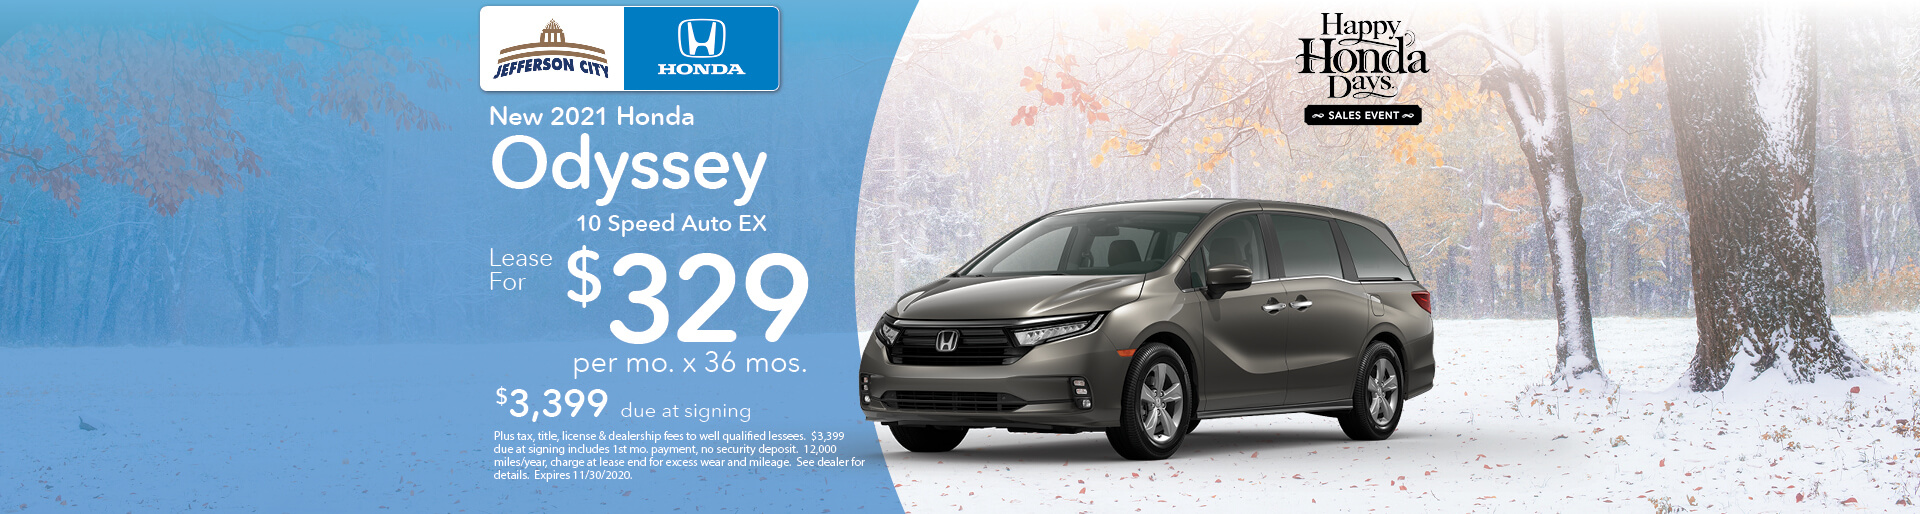 2020 Odyssey EX | Lease for $330/mo x 36 Mos. | Jefferson City, MO